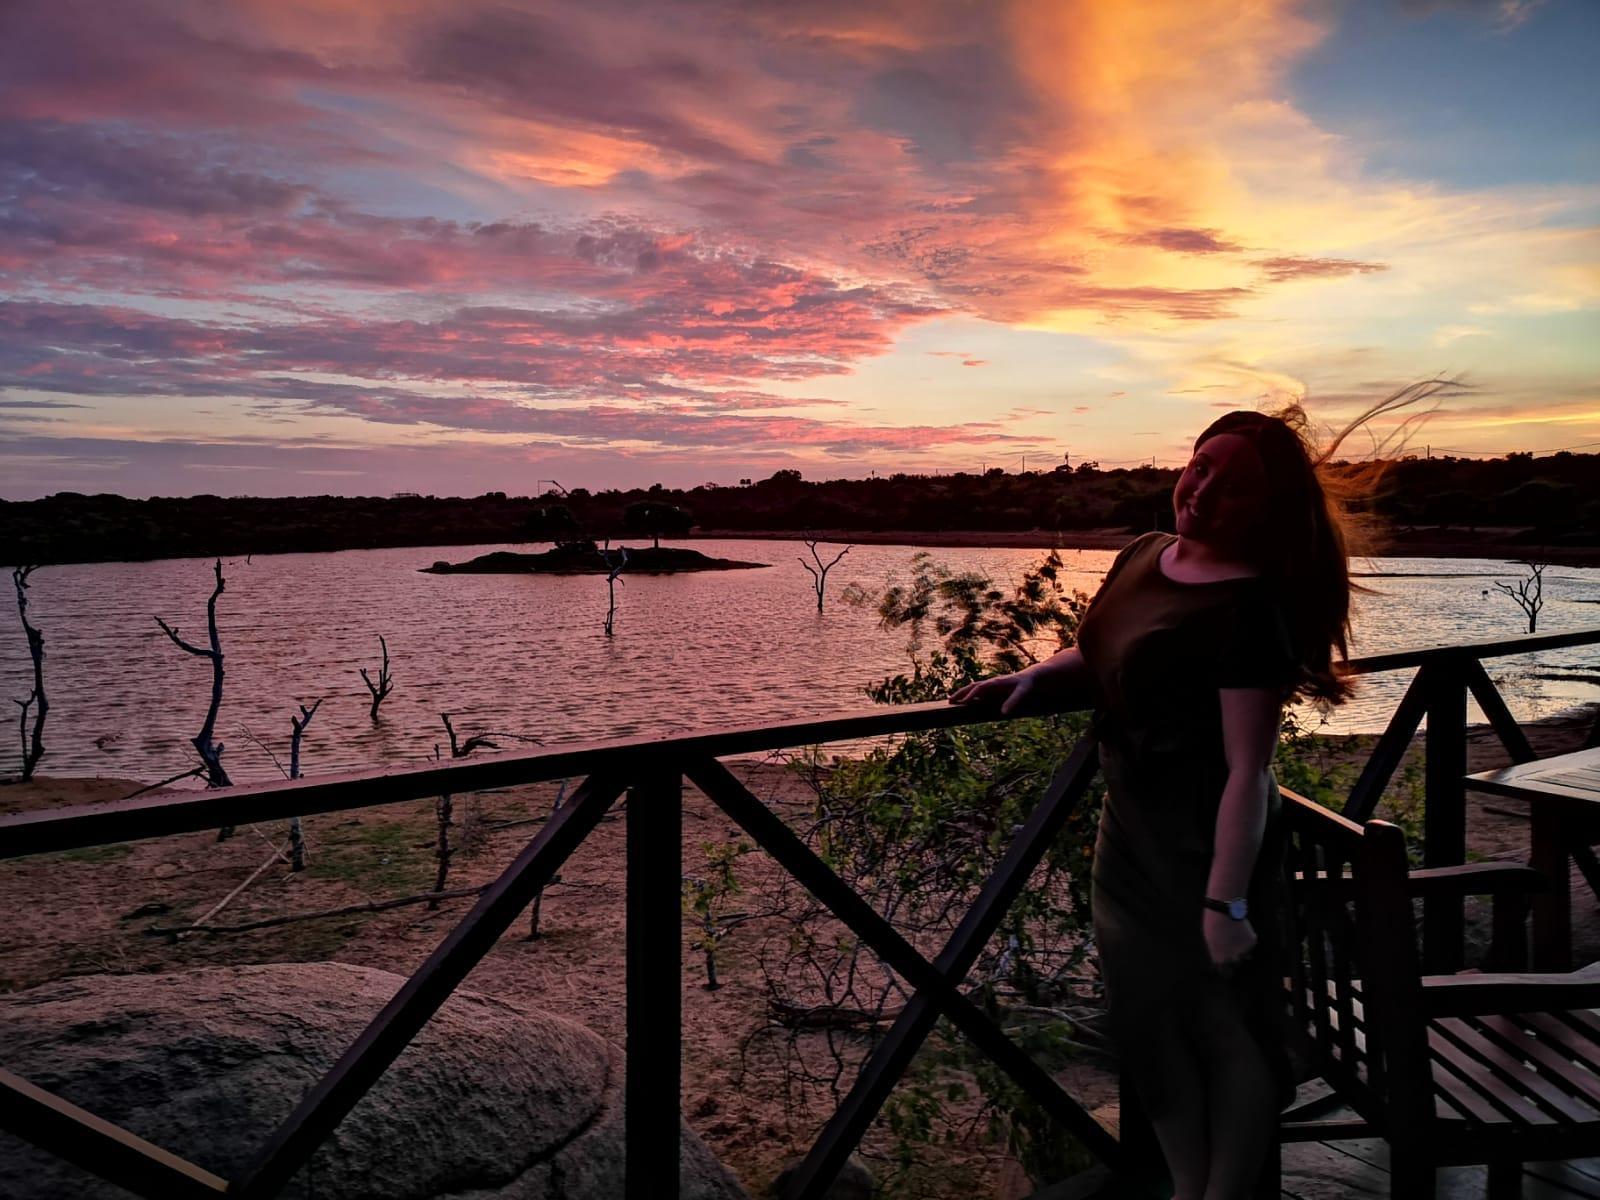 invite-to-paradise-sri-lanka-holiday-honeymoon-specialists-customer-feedback-elin-jordan-luce-yala-sunset-balcony.JPG